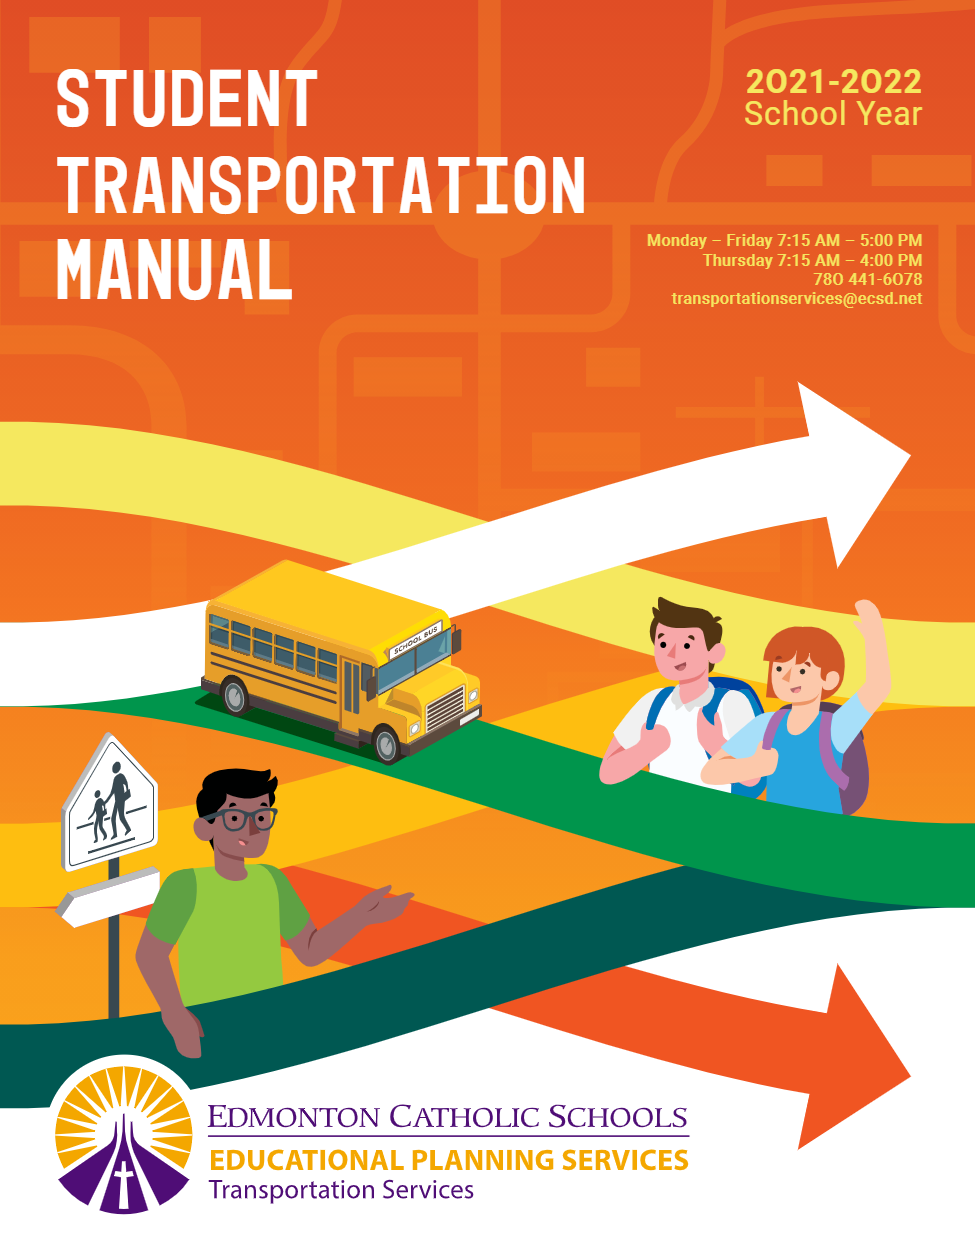 Transportation Manual Cover.png